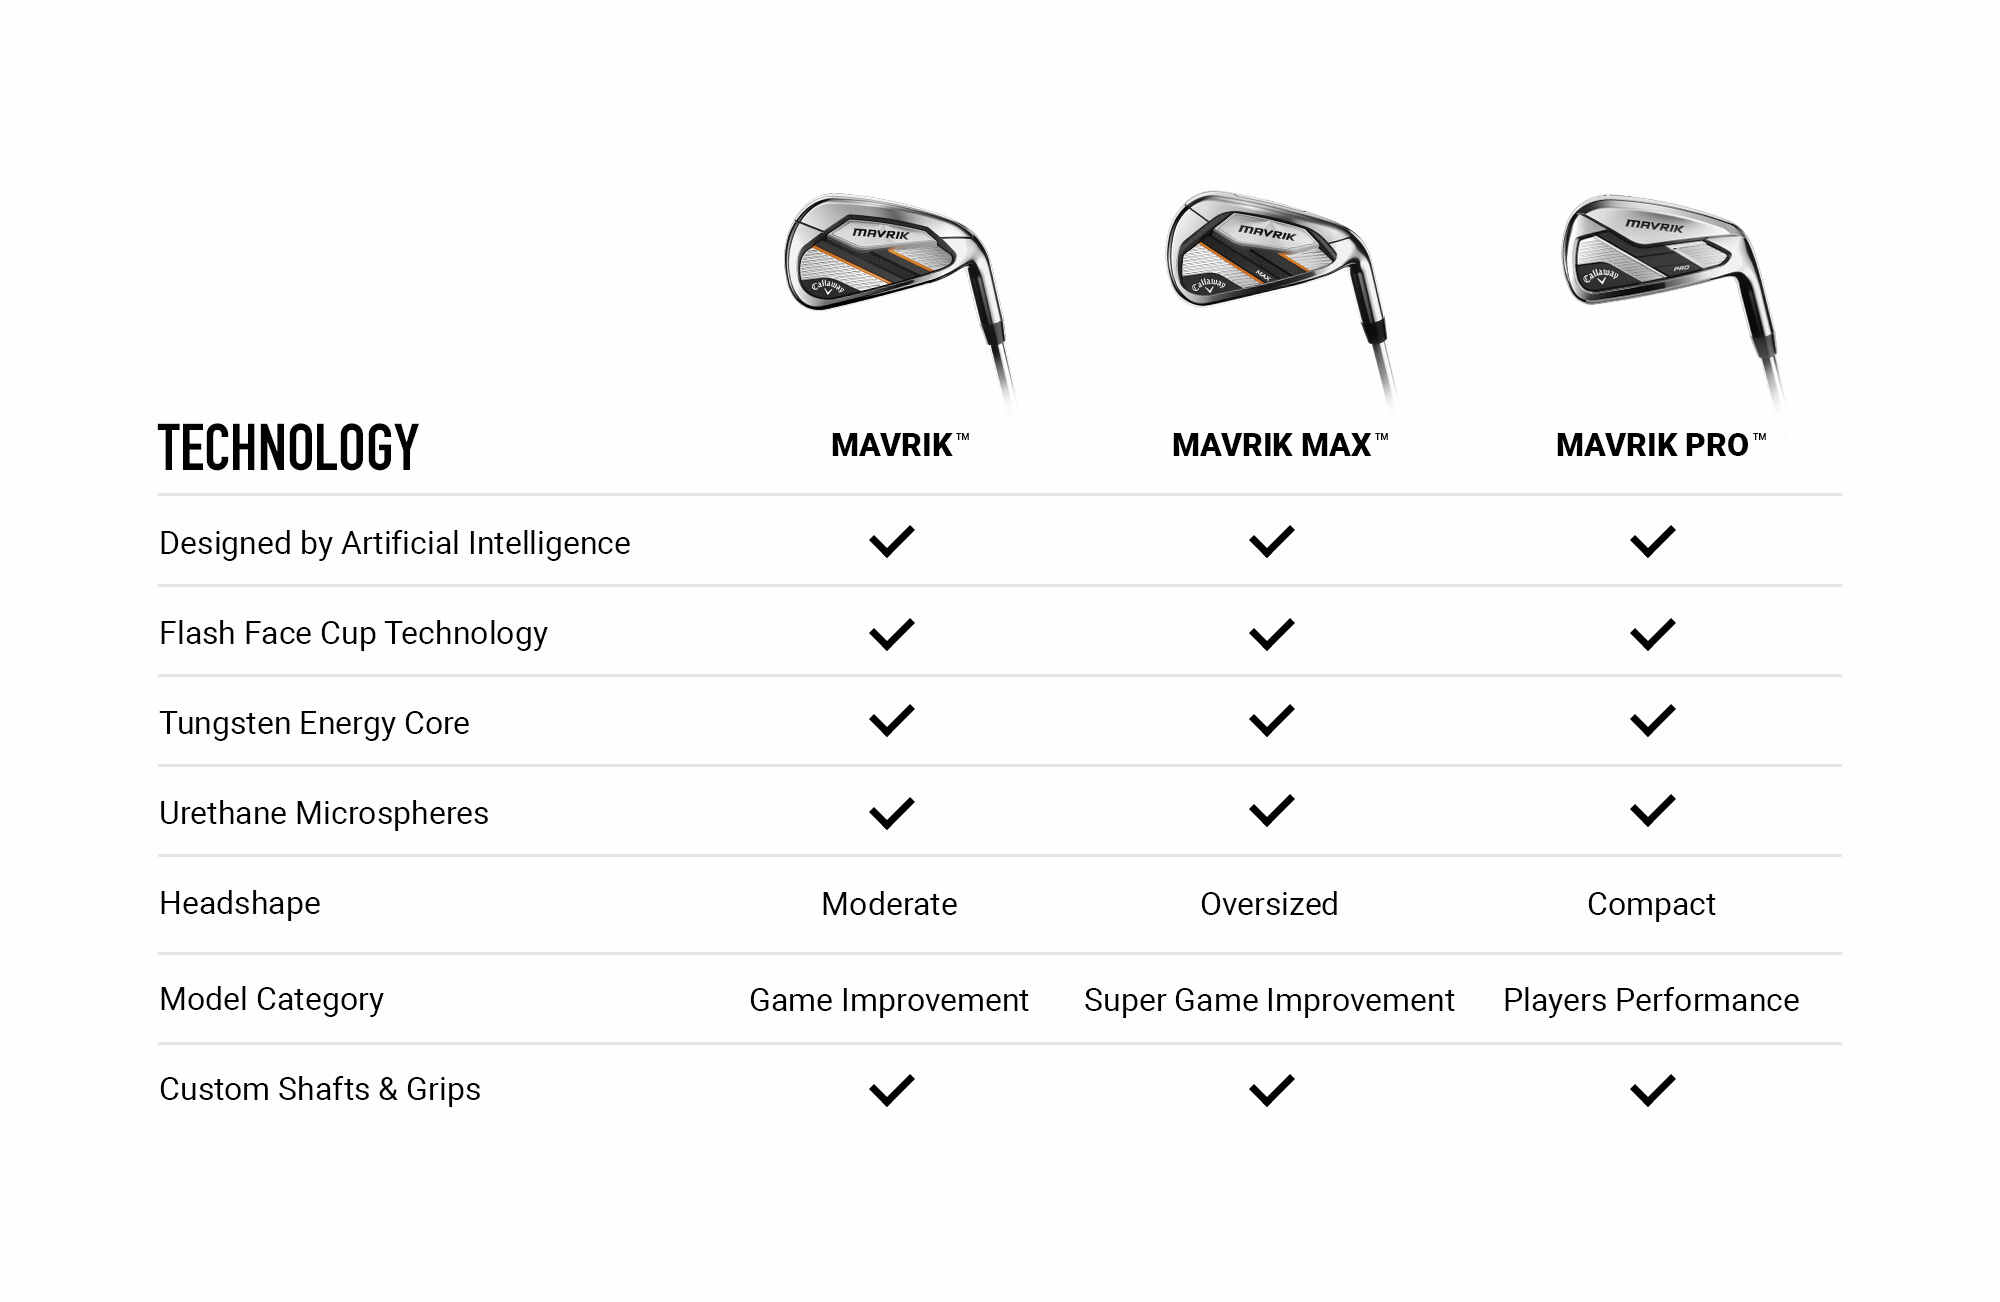 Callaway MAVRIK Irons Comparison Chart